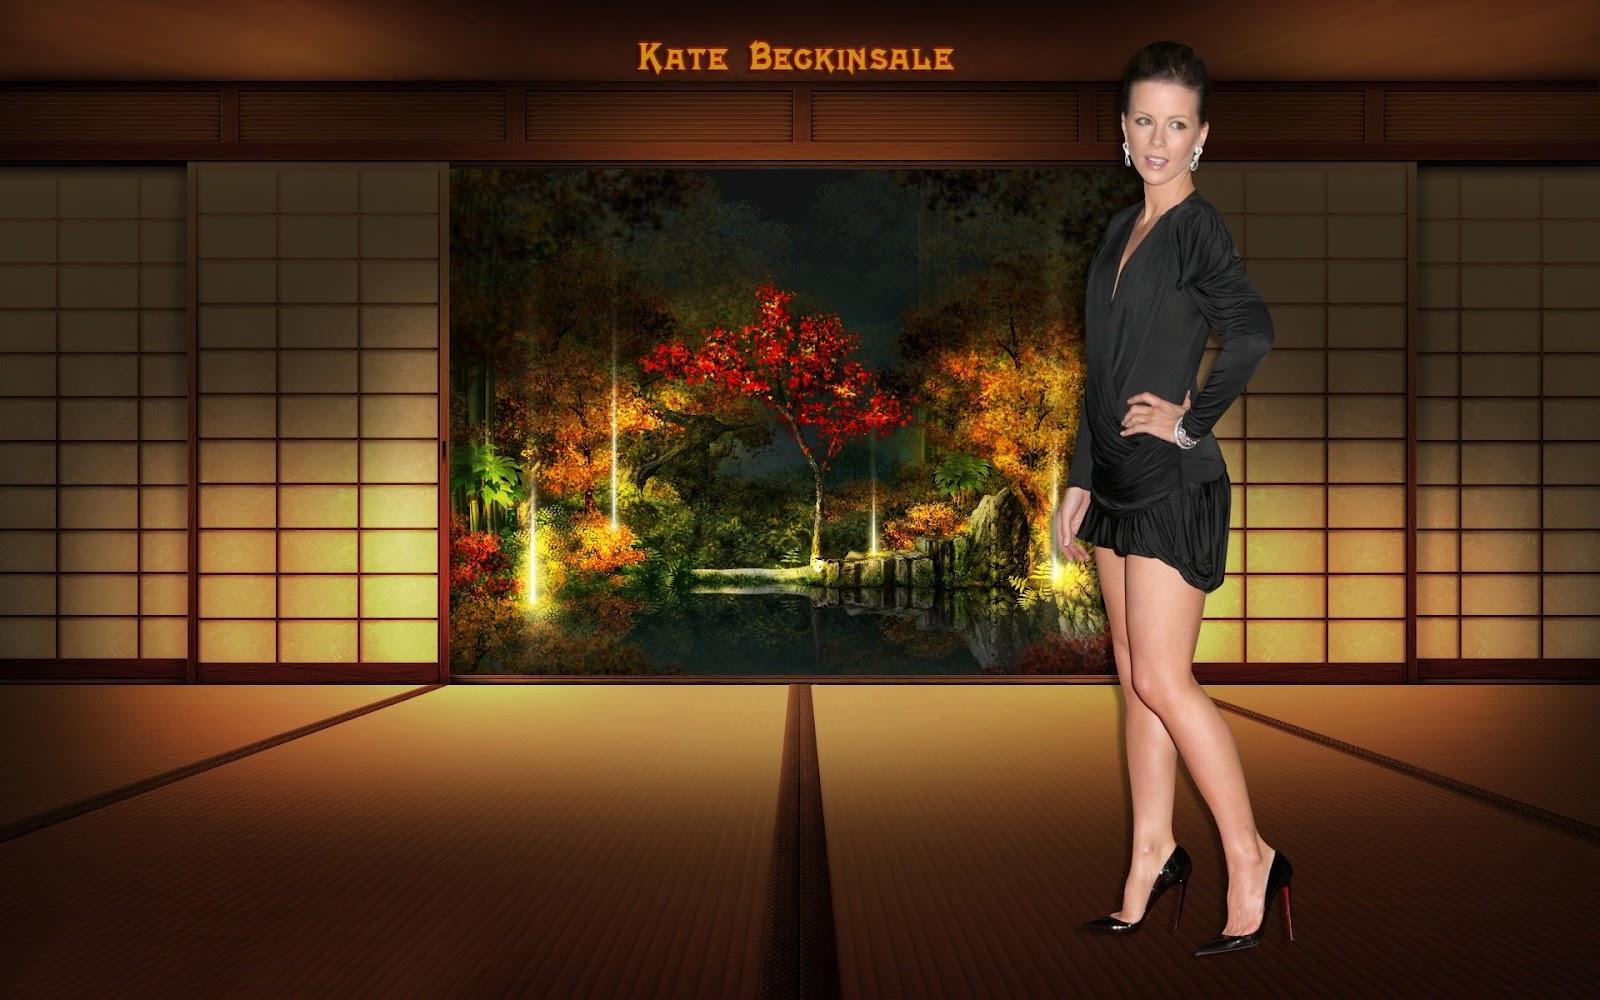 http://2.bp.blogspot.com/-UNkooymK3VI/UGOnocUkgSI/AAAAAAAABgY/pkx_8OG5H00/s1600/kate_beckinsale.jpg